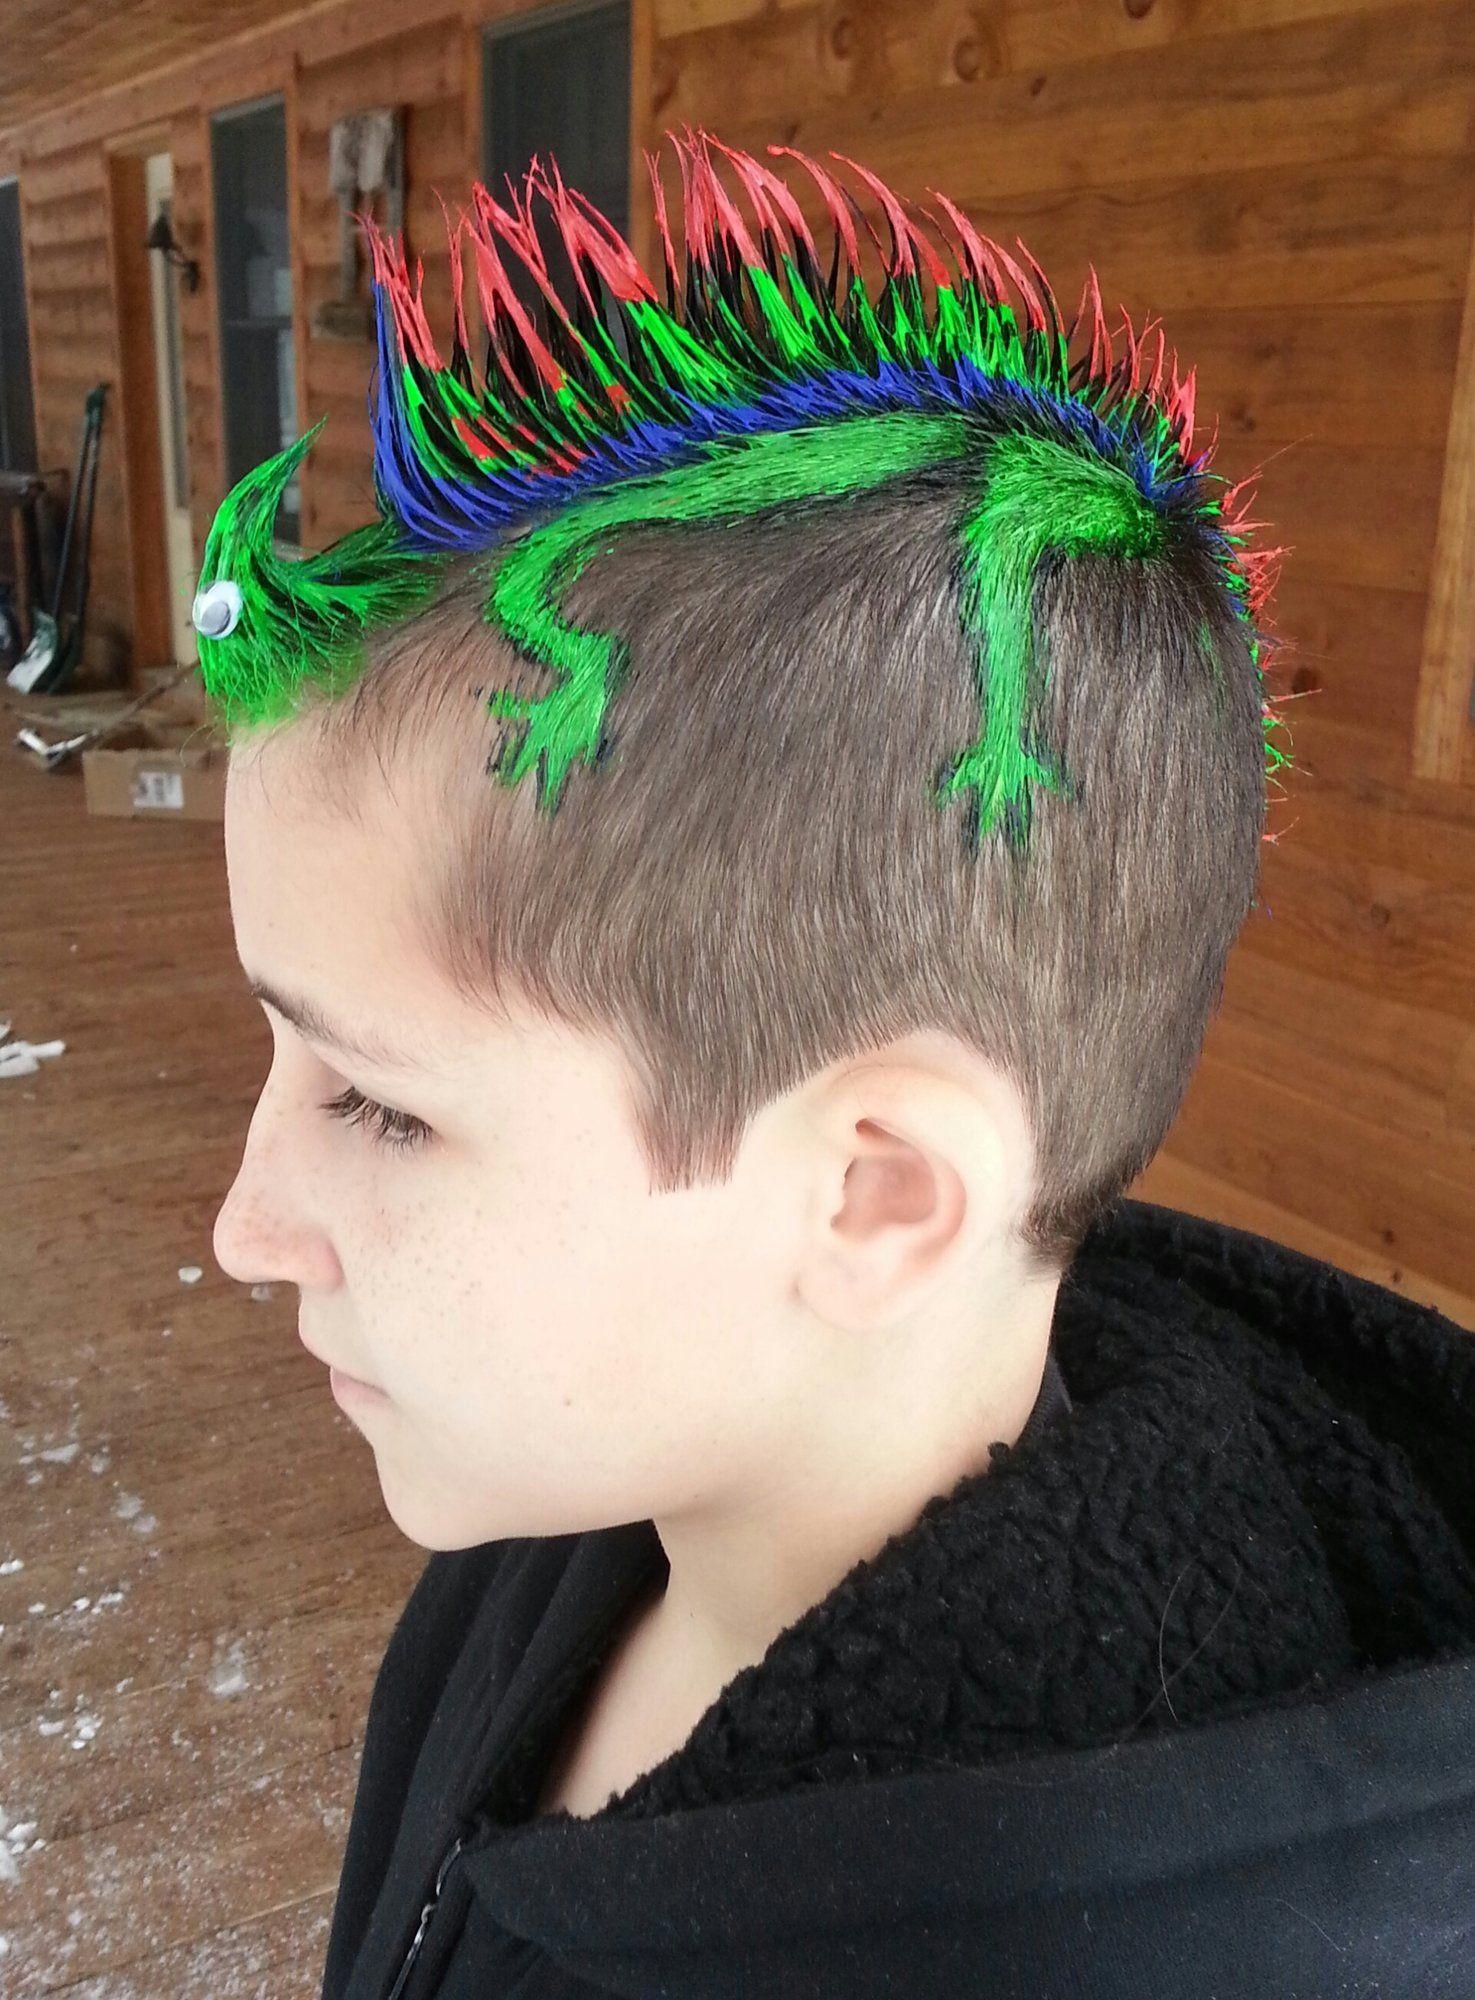 Boy hairstyle simple  wild ideas for wacky hair day  costumes  pinterest  hair hair